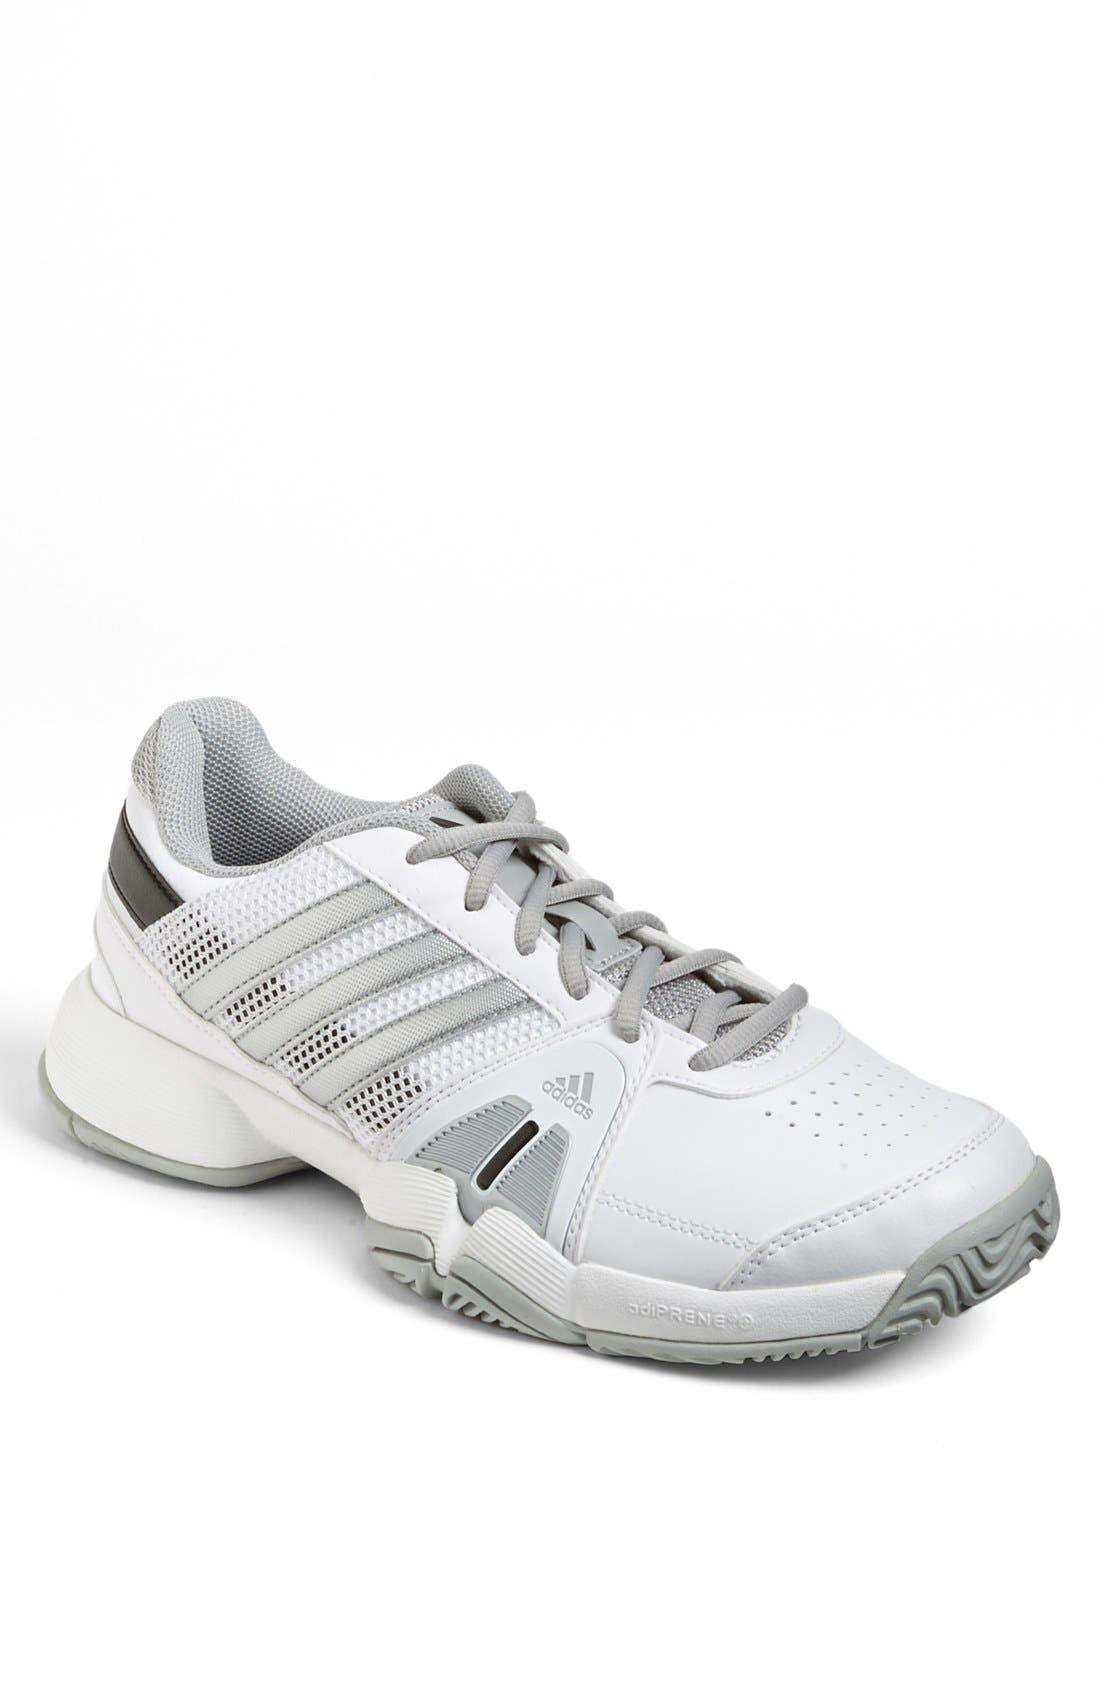 Alternate Image 1 Selected - adidas 'adiPower Barricade Team 3' Tennis Shoe   (Men)